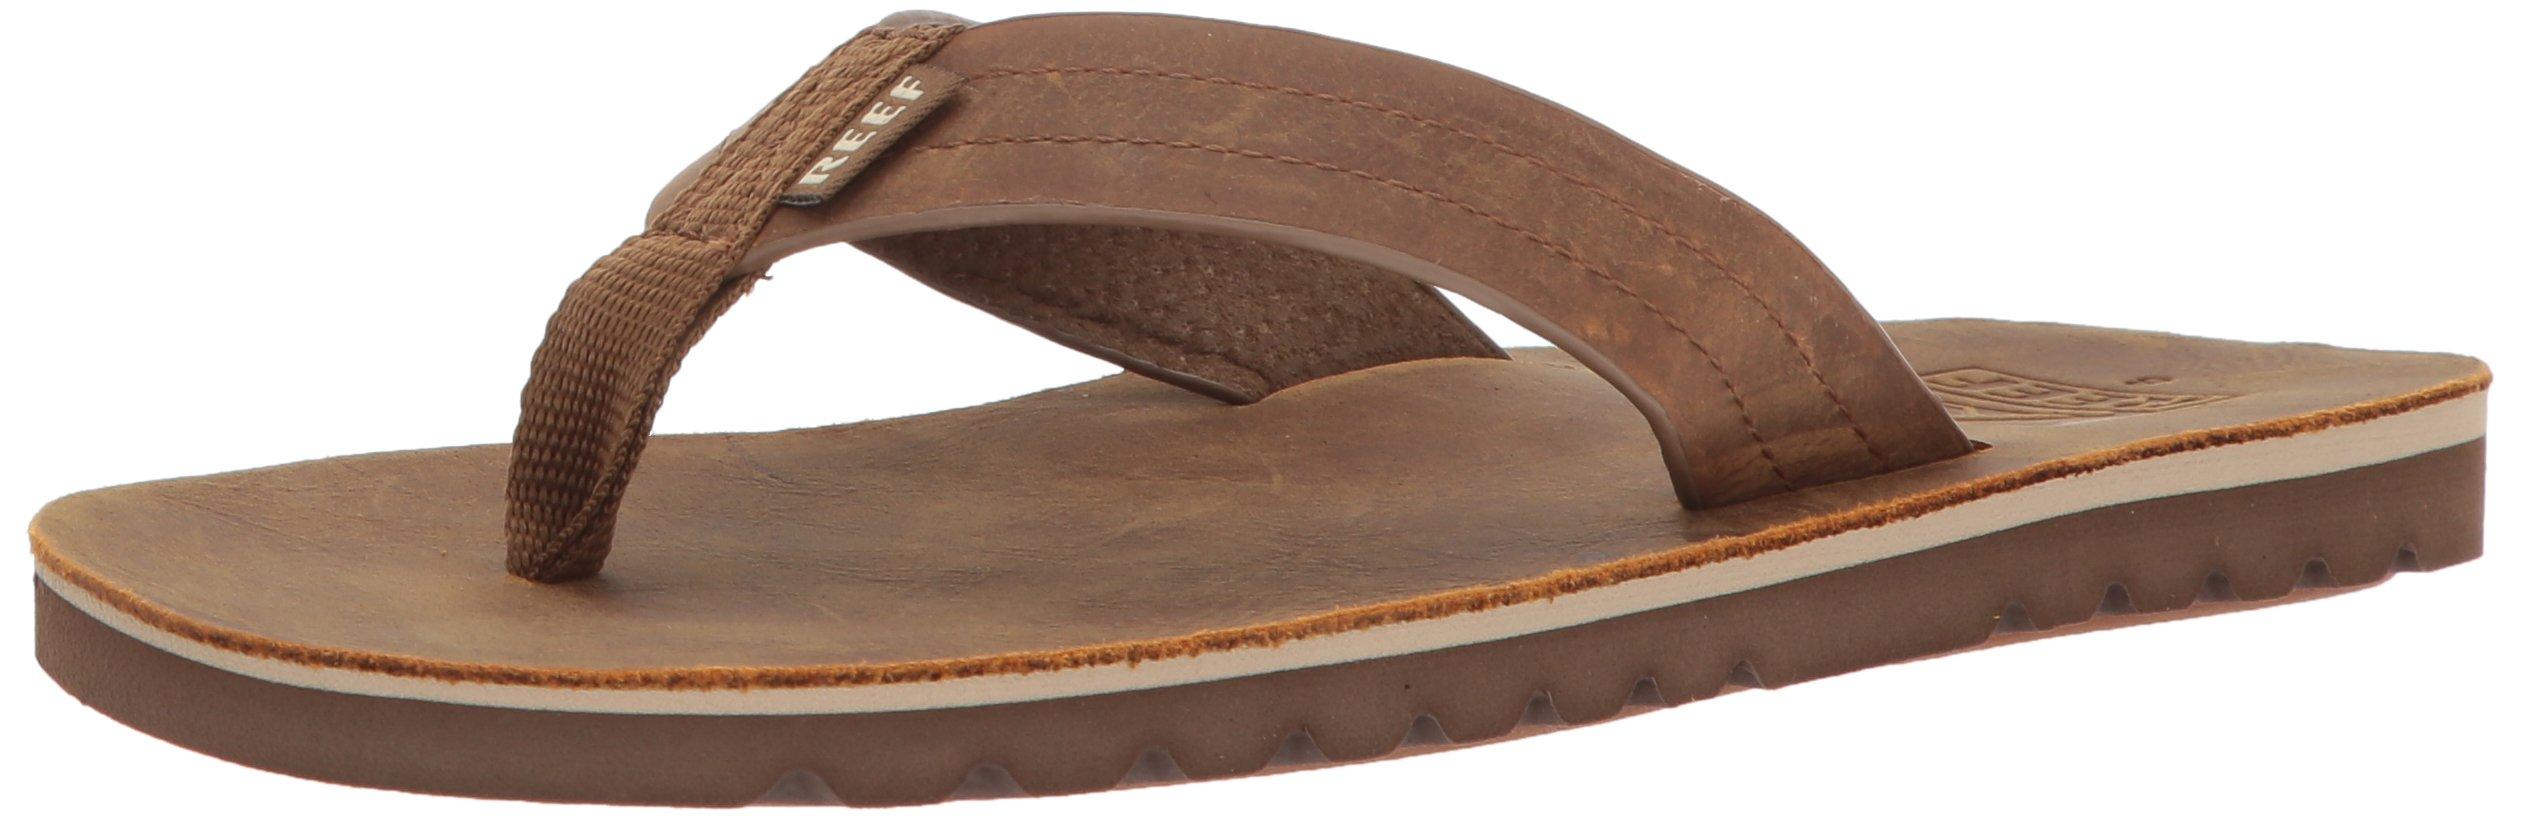 Reef Men's Voyage LE Sandal, Brown/Bronze, 10 M US